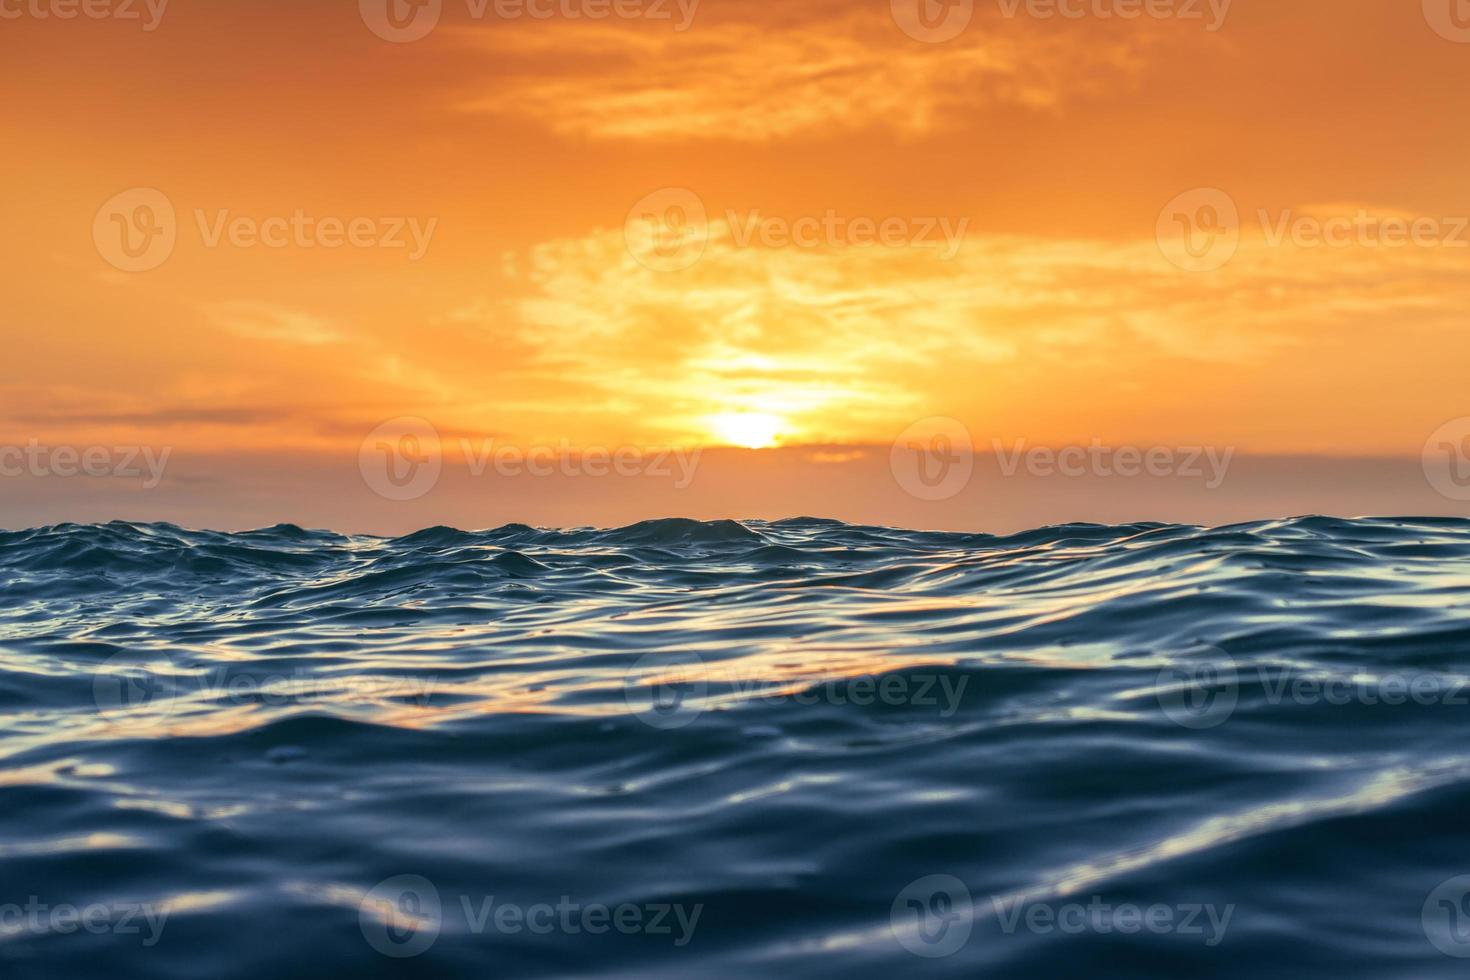 alba e onde splendenti nell'oceano foto